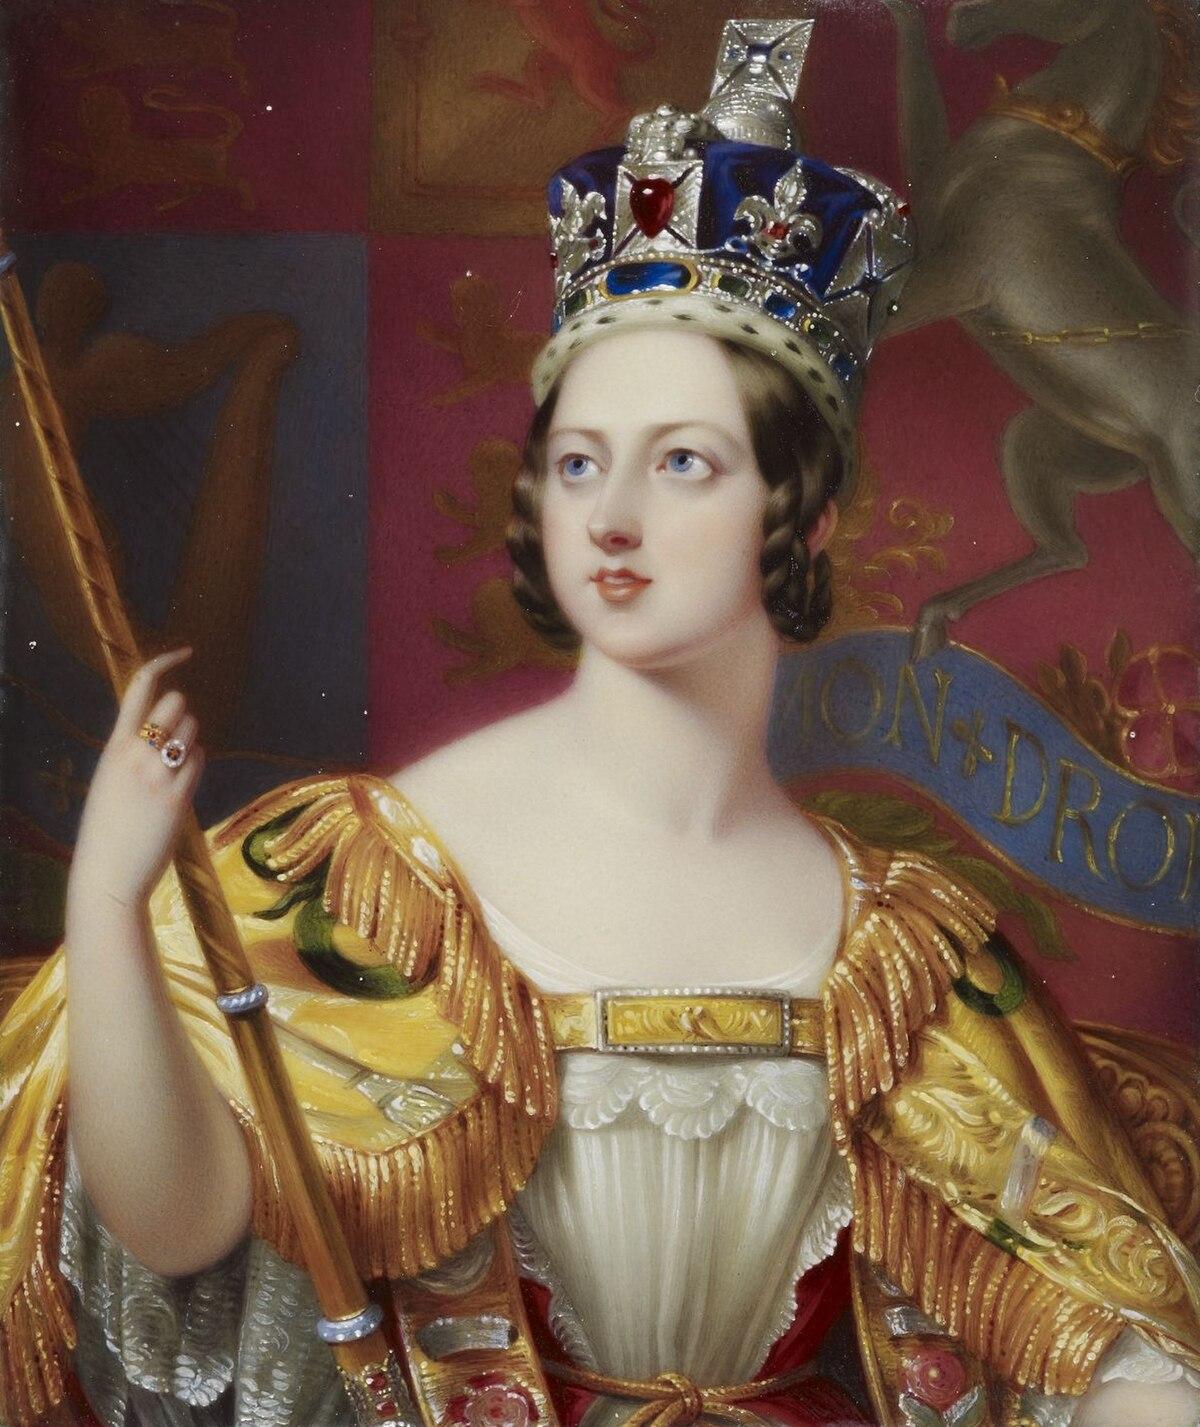 Dronning victoria.jpg